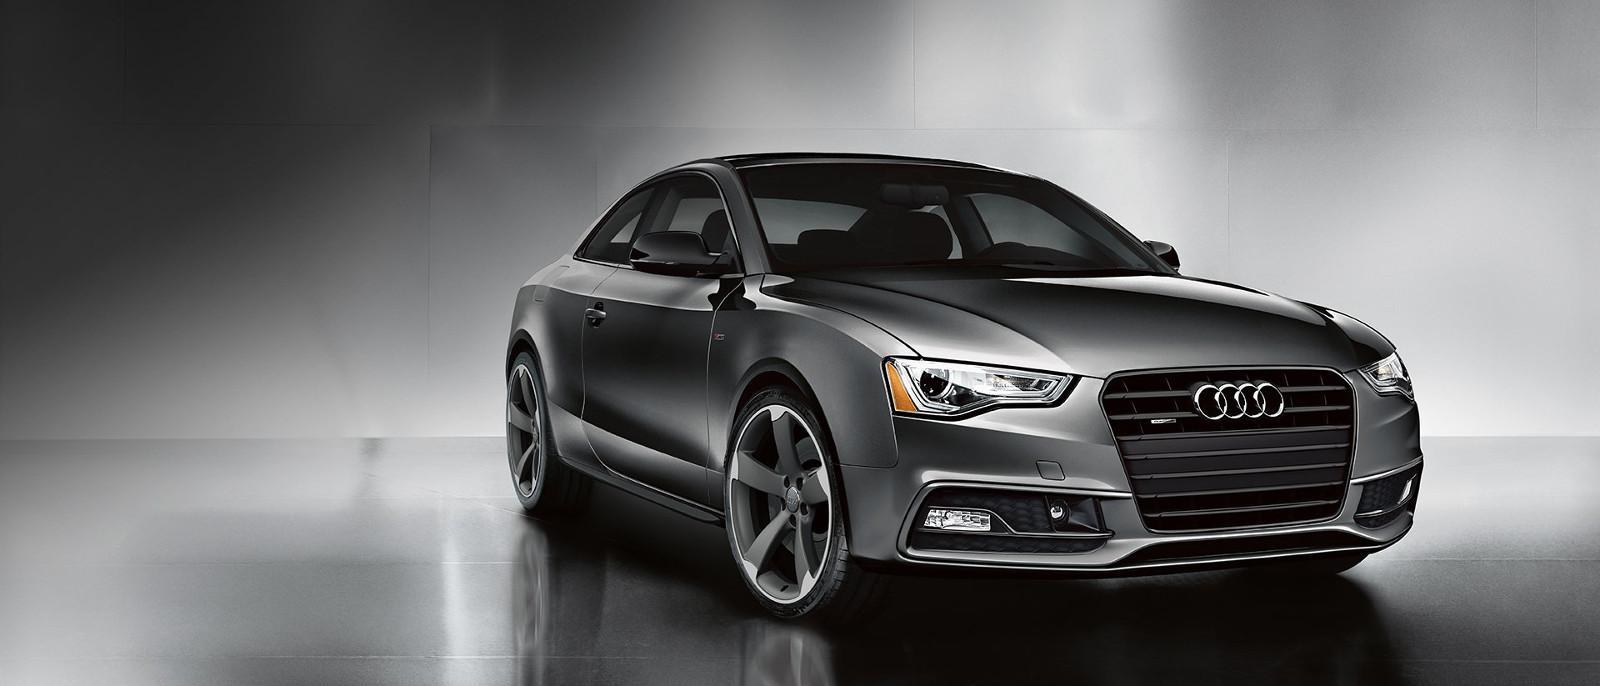 Audi Hilton Head Receives Magna Society Recognition Award -- Audi Hilton Head   PRLog